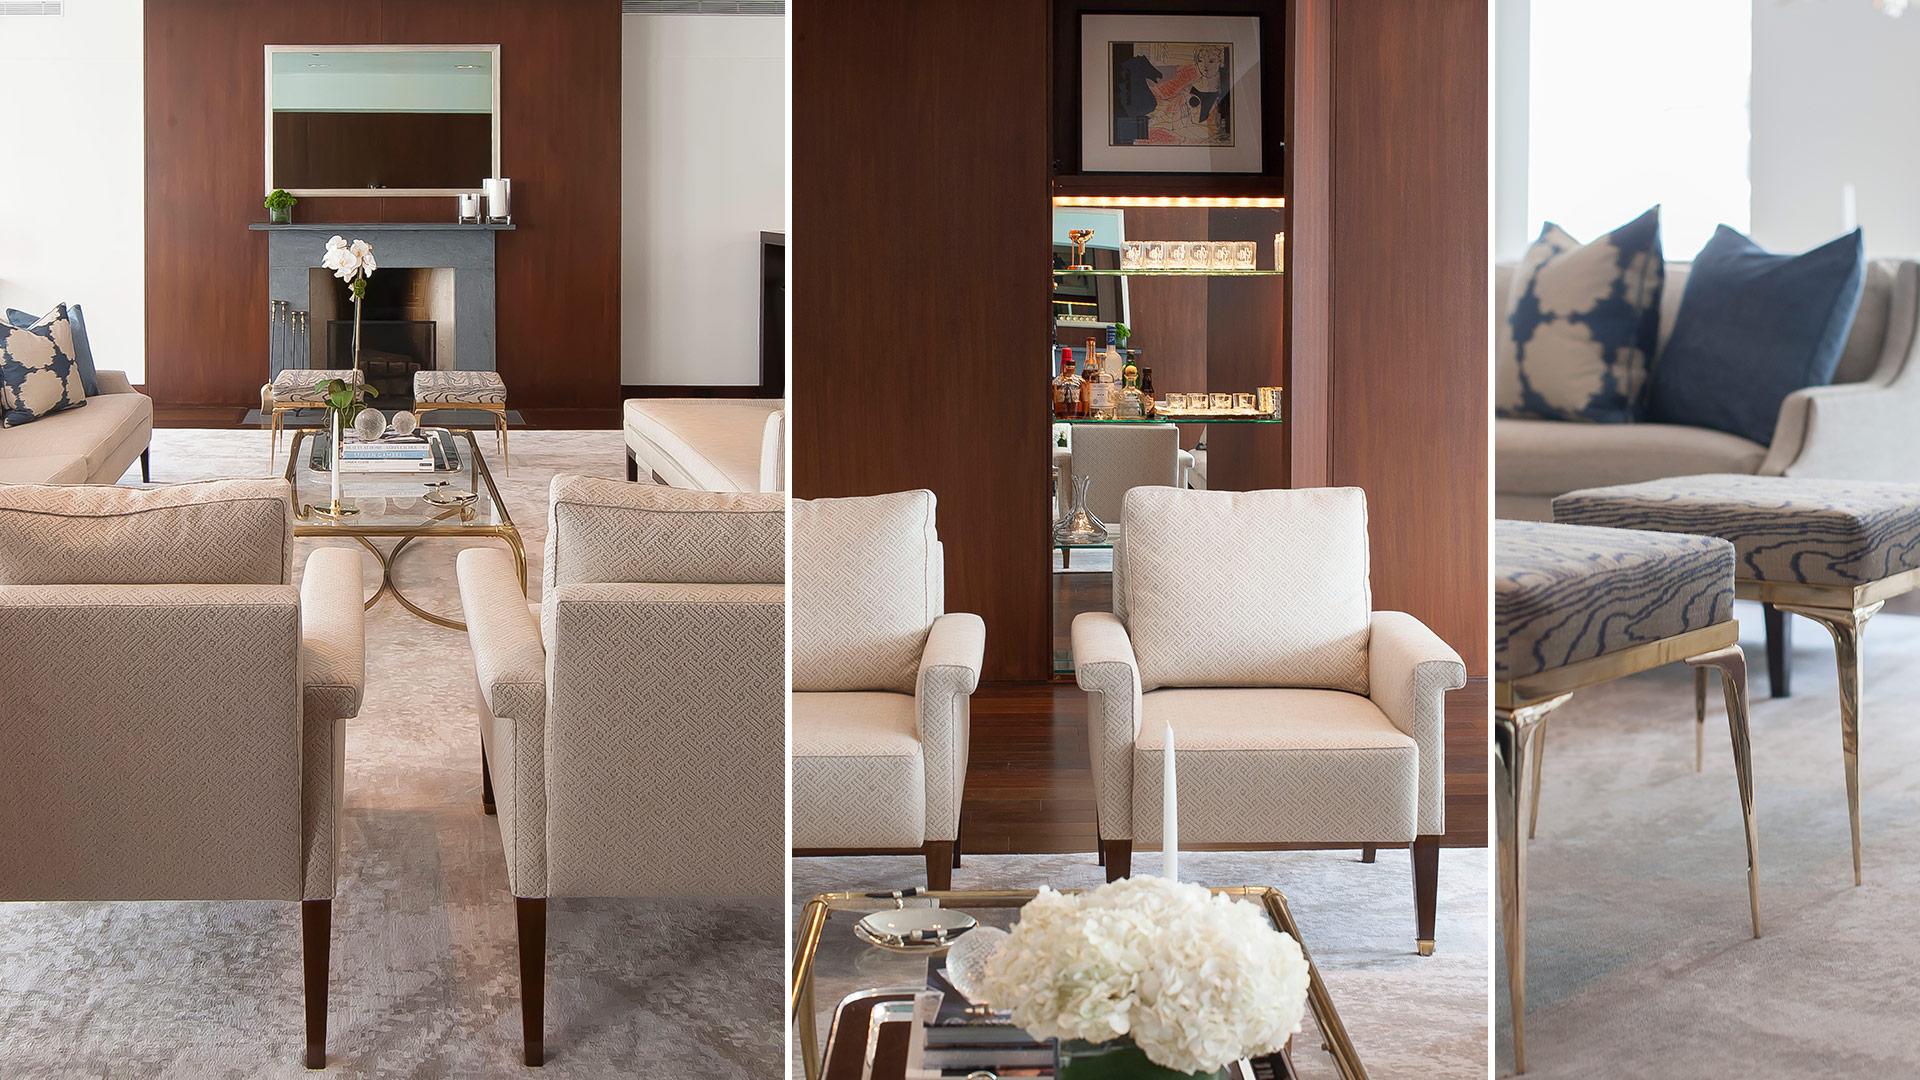 Hudson laight area interior design for Living area interior design